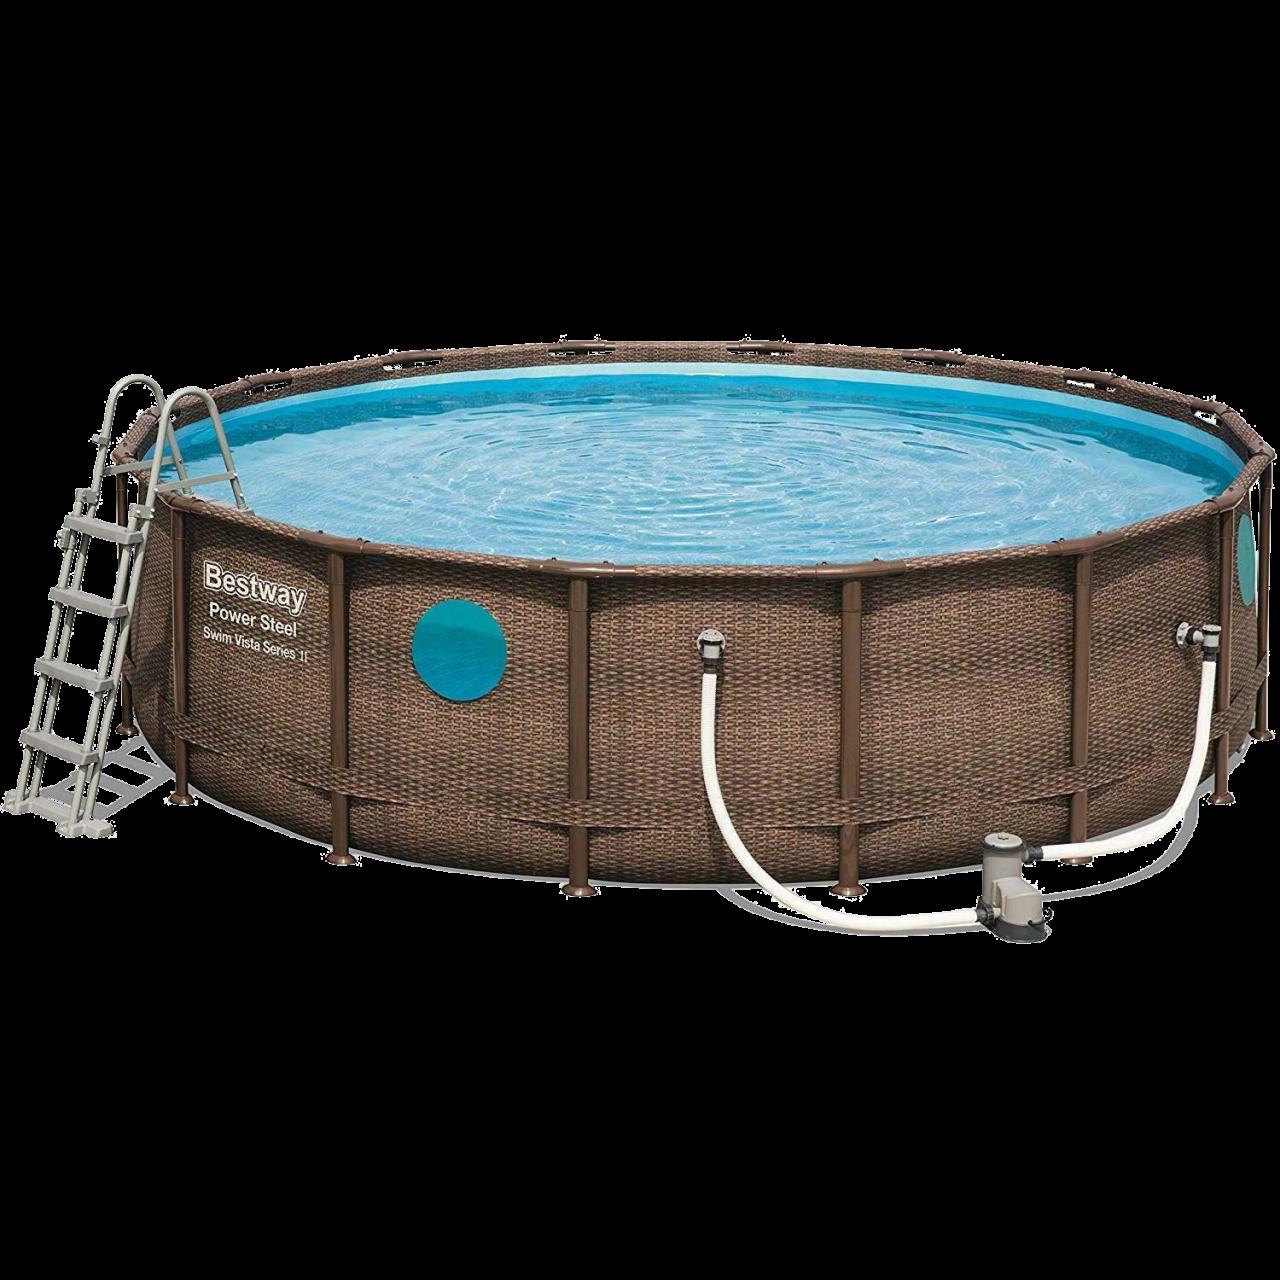 Bestway 56725 Power Steel Pool Set Swim Vista Rattanoptik 488x122 cm